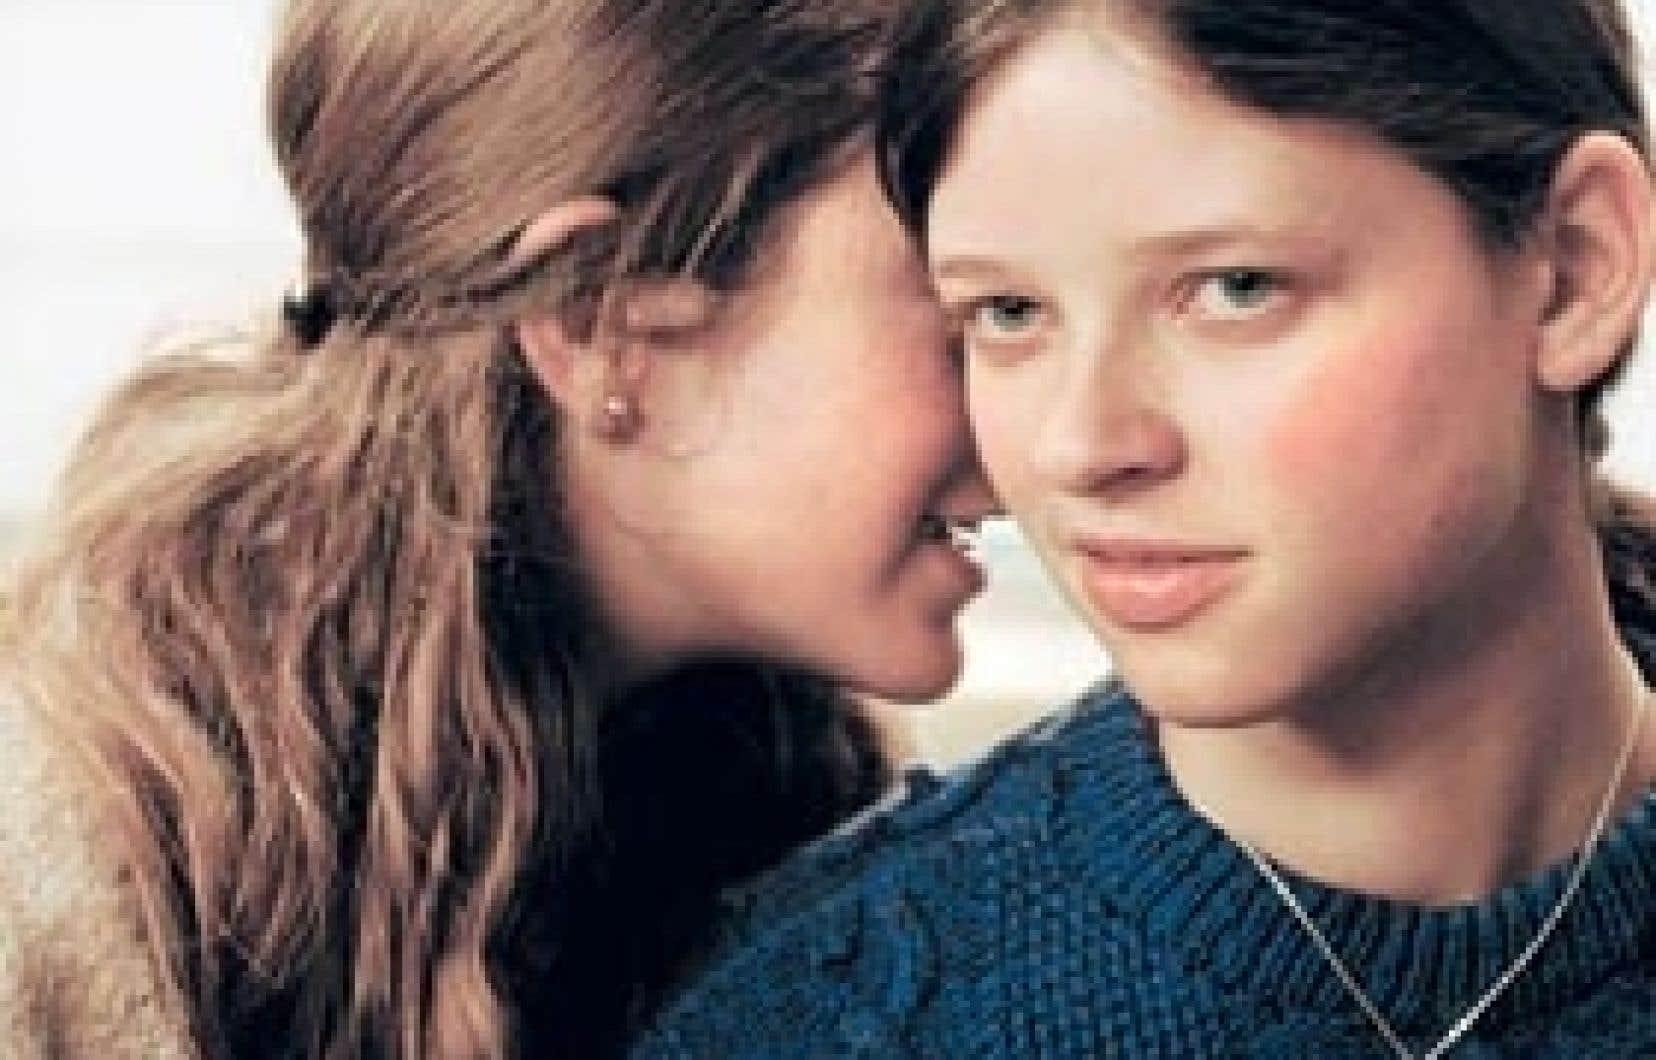 Alliance Une scène du film La Sainte Fille, de Lucrecia Martel.